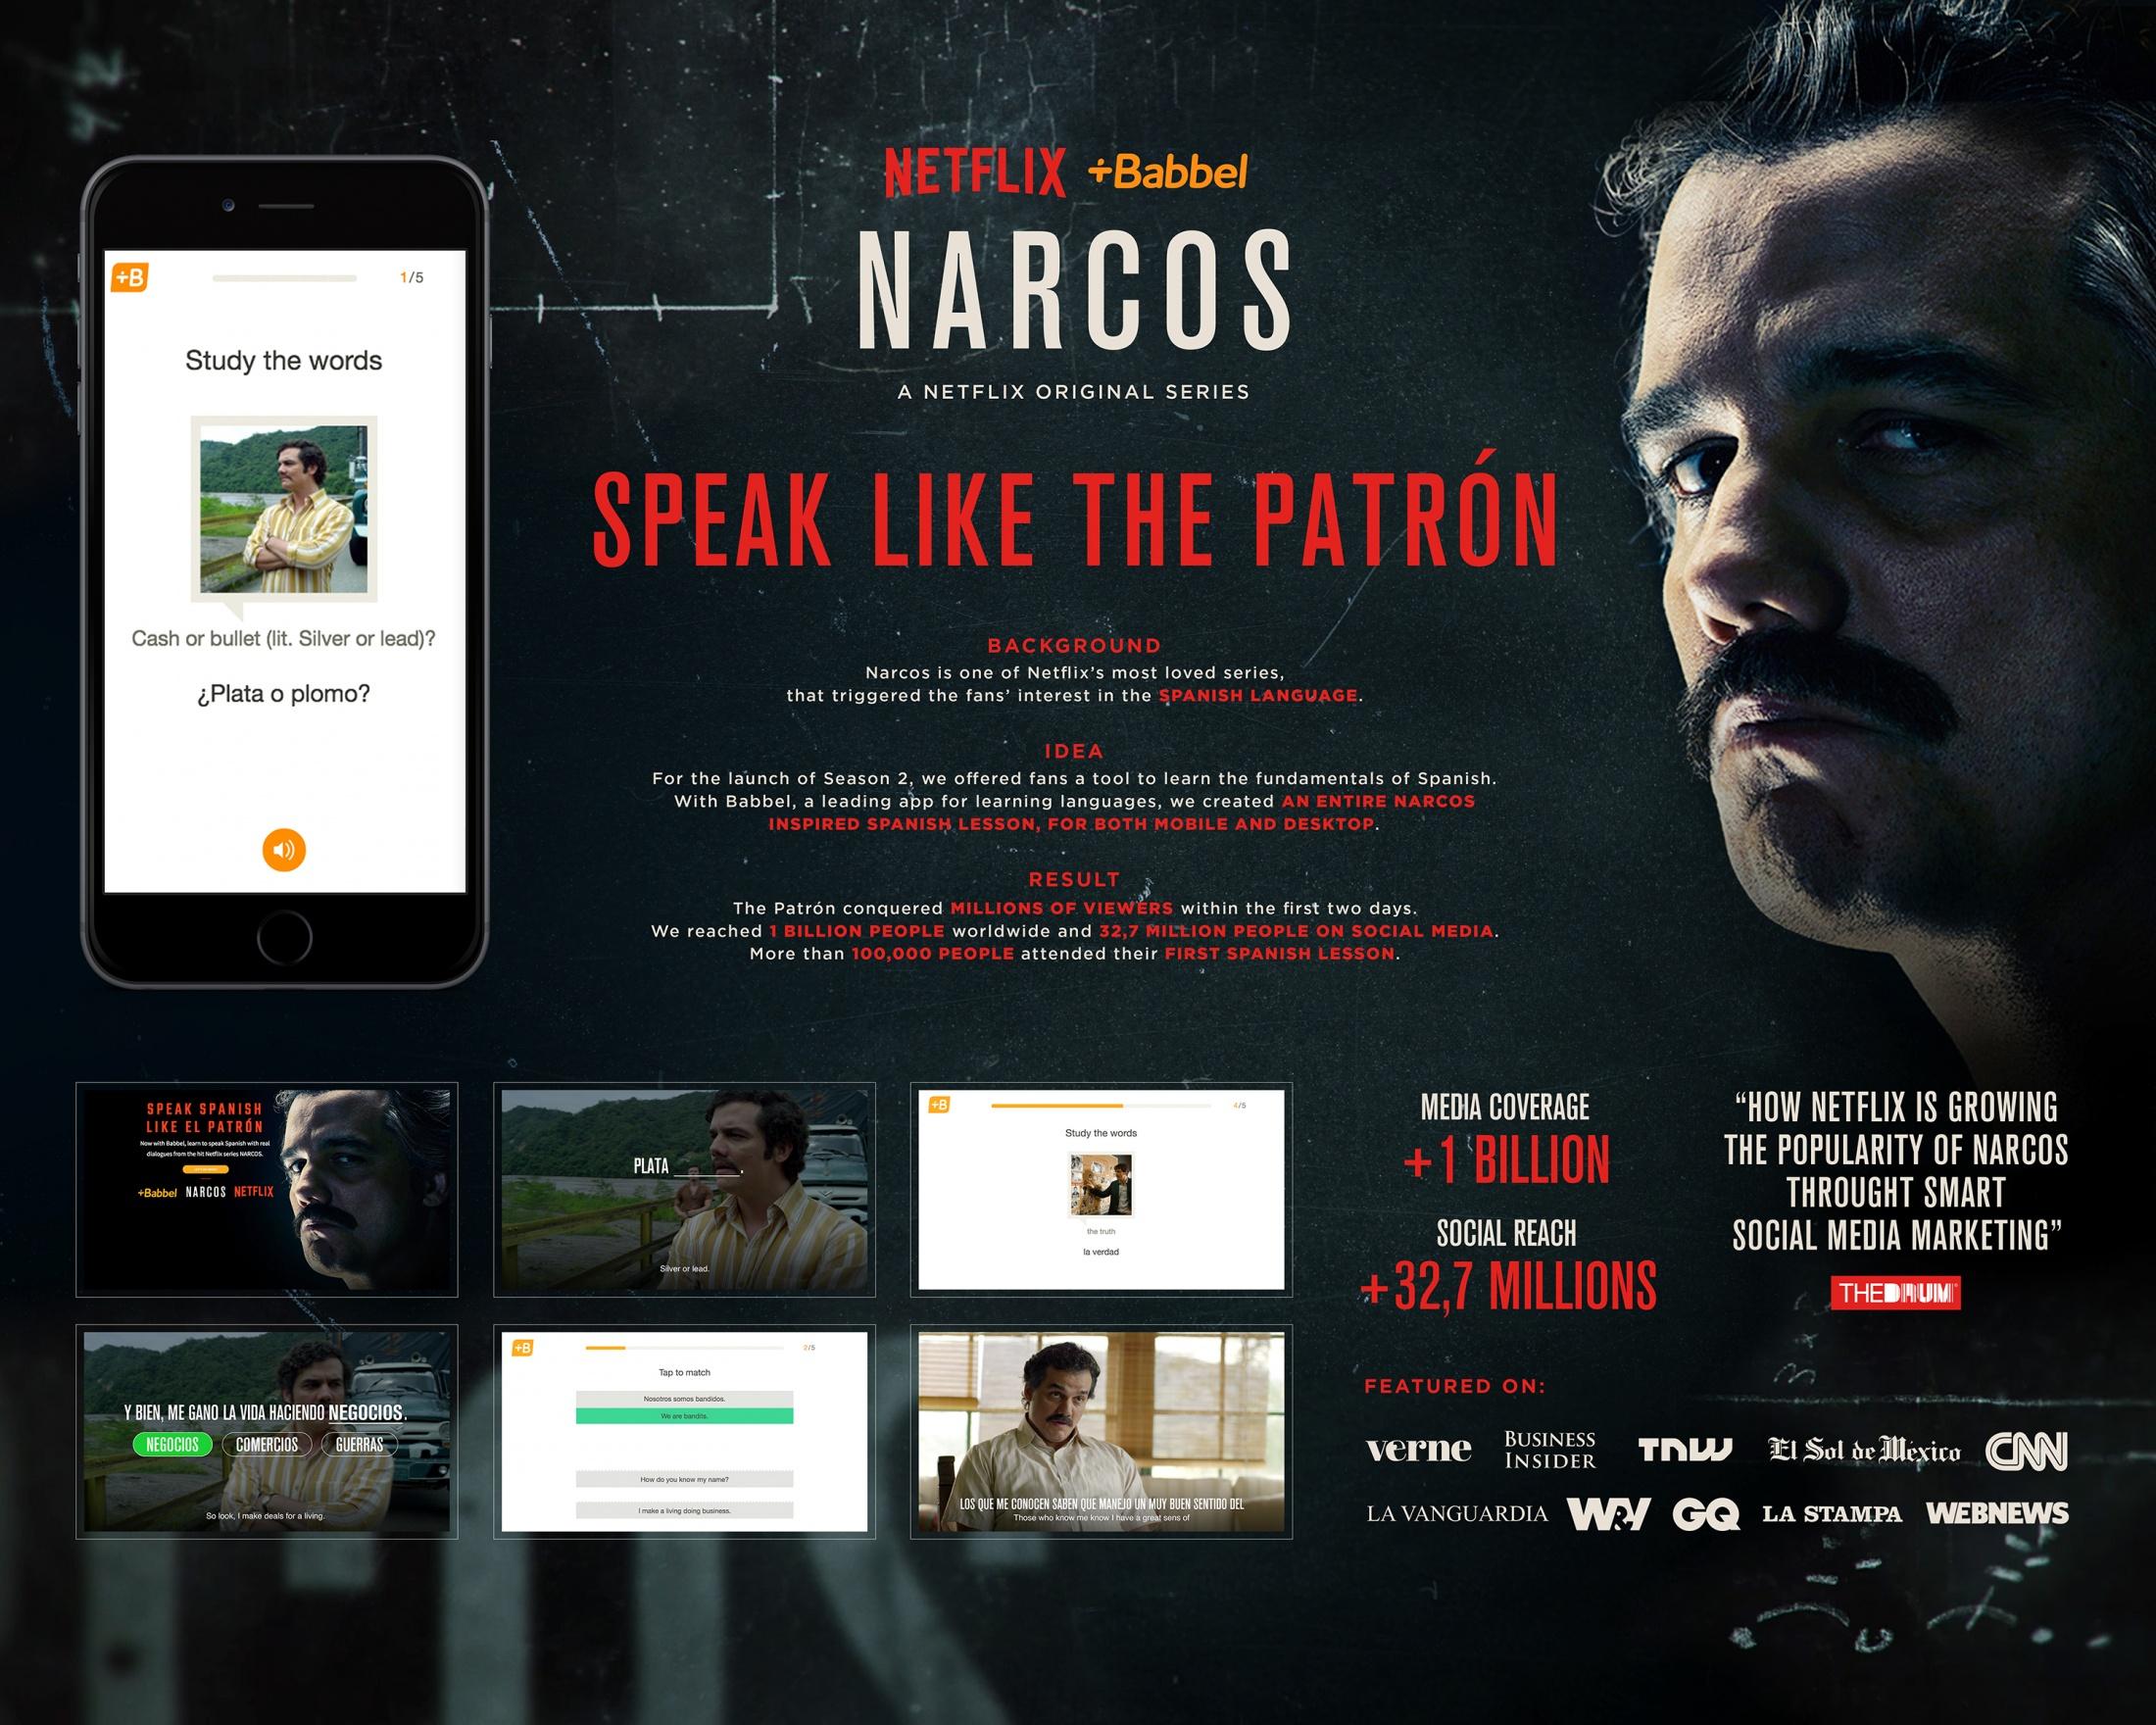 Thumbnail for Speak like the Patrón